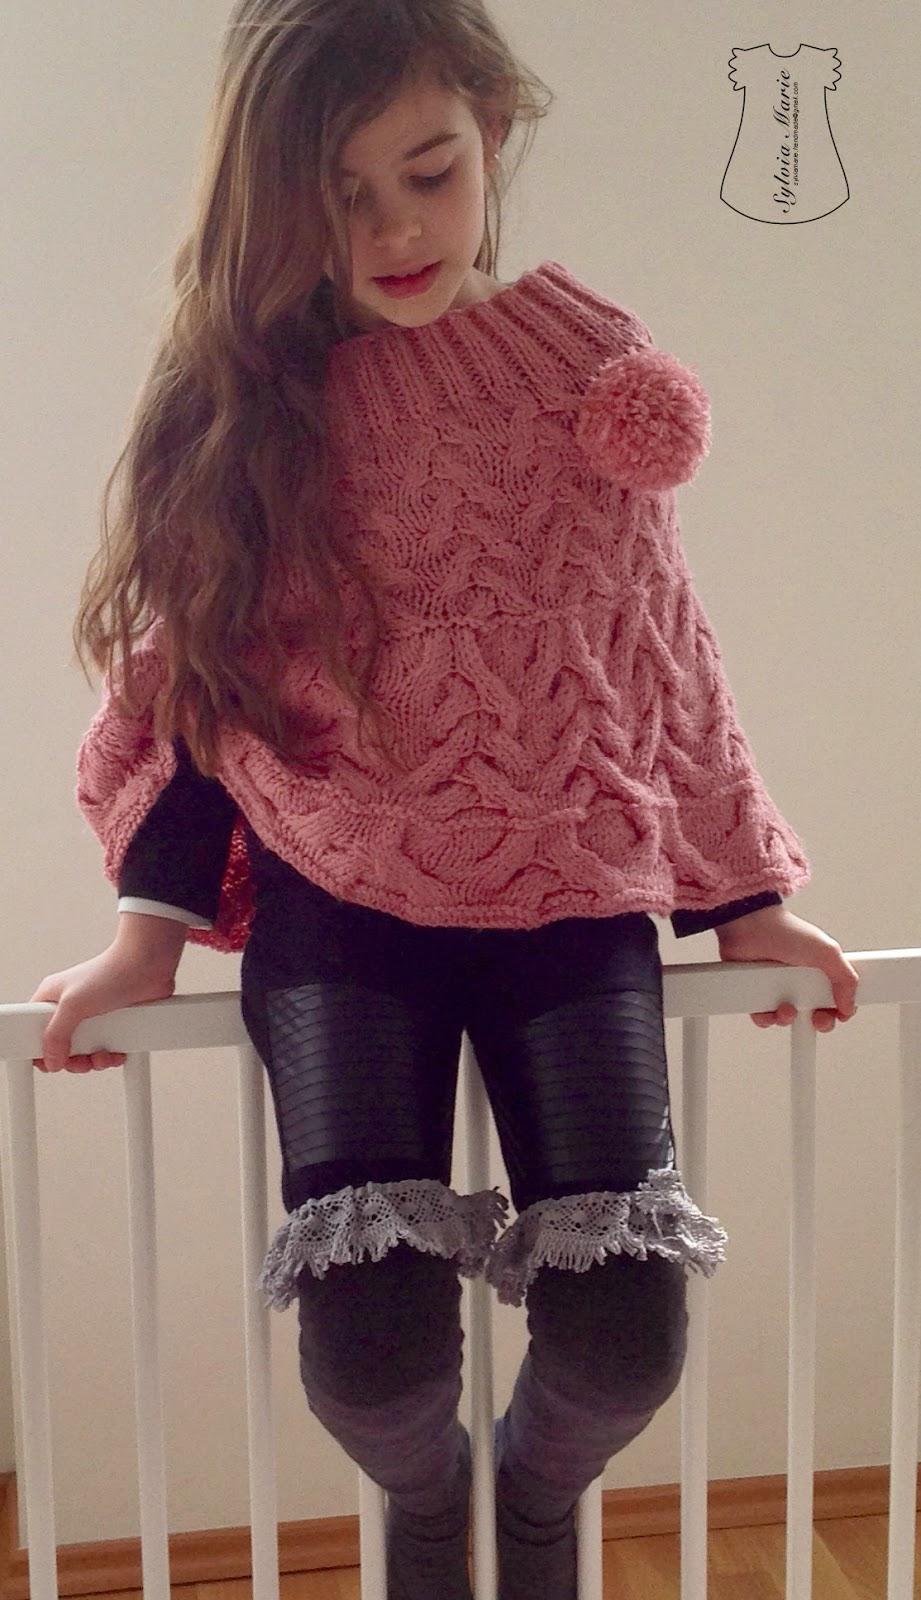 Poncho y calcetines largos Overknees